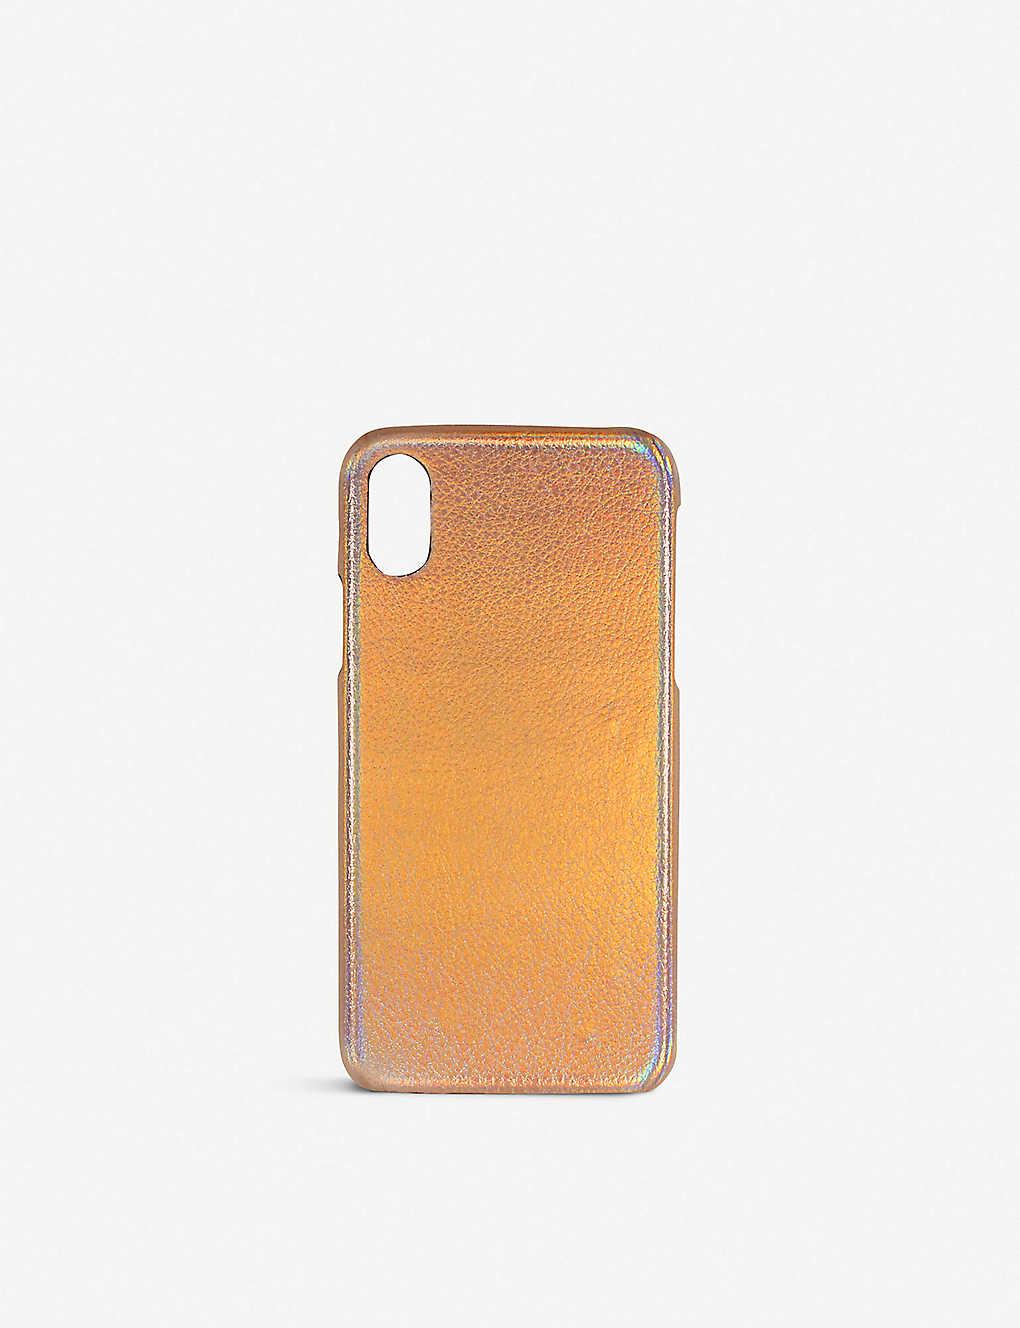 new product 3b03e a66c6 Iridescent metallic iPhone X case